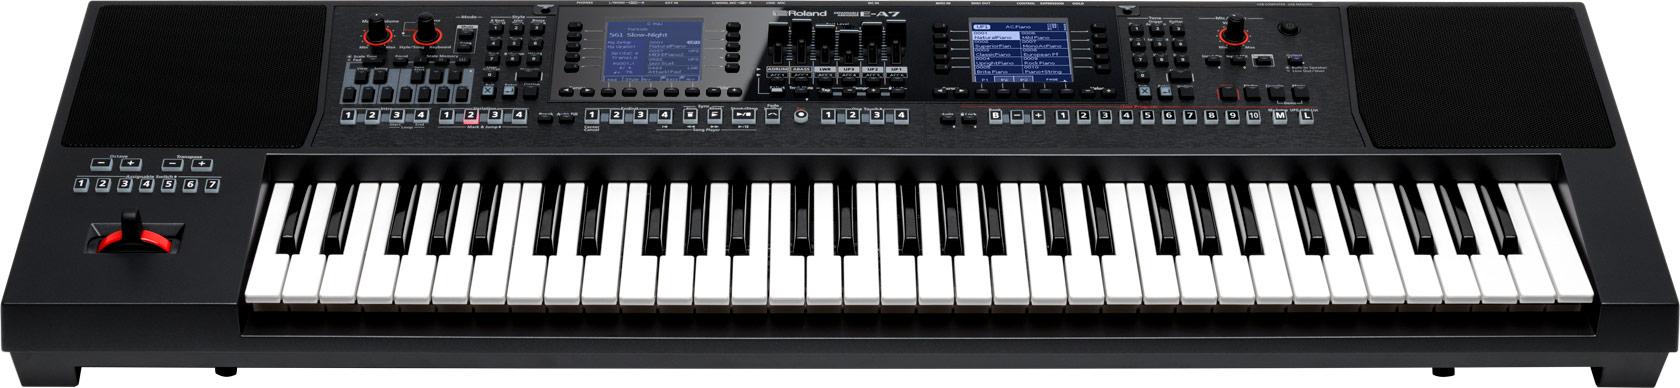 roland e-a7 keyboard